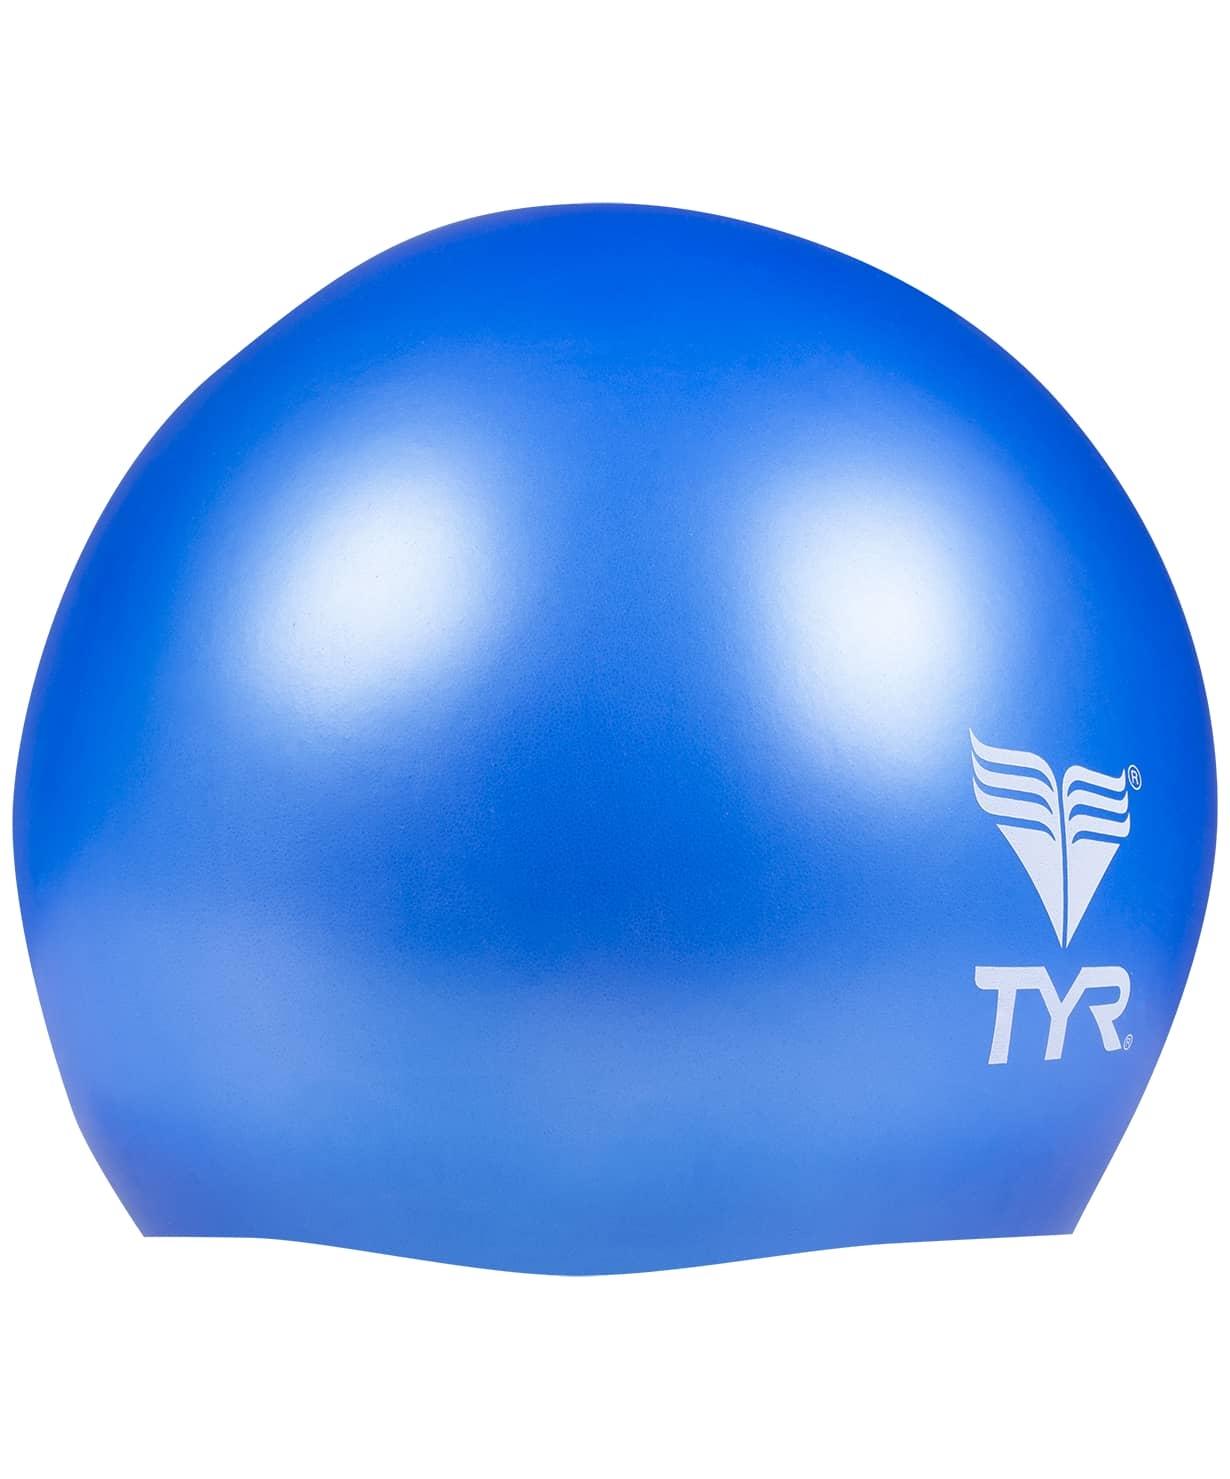 Шапочка плавательная Wrinkle Free Junior Silicone Cap, силикон, LCSJR/428, голубой